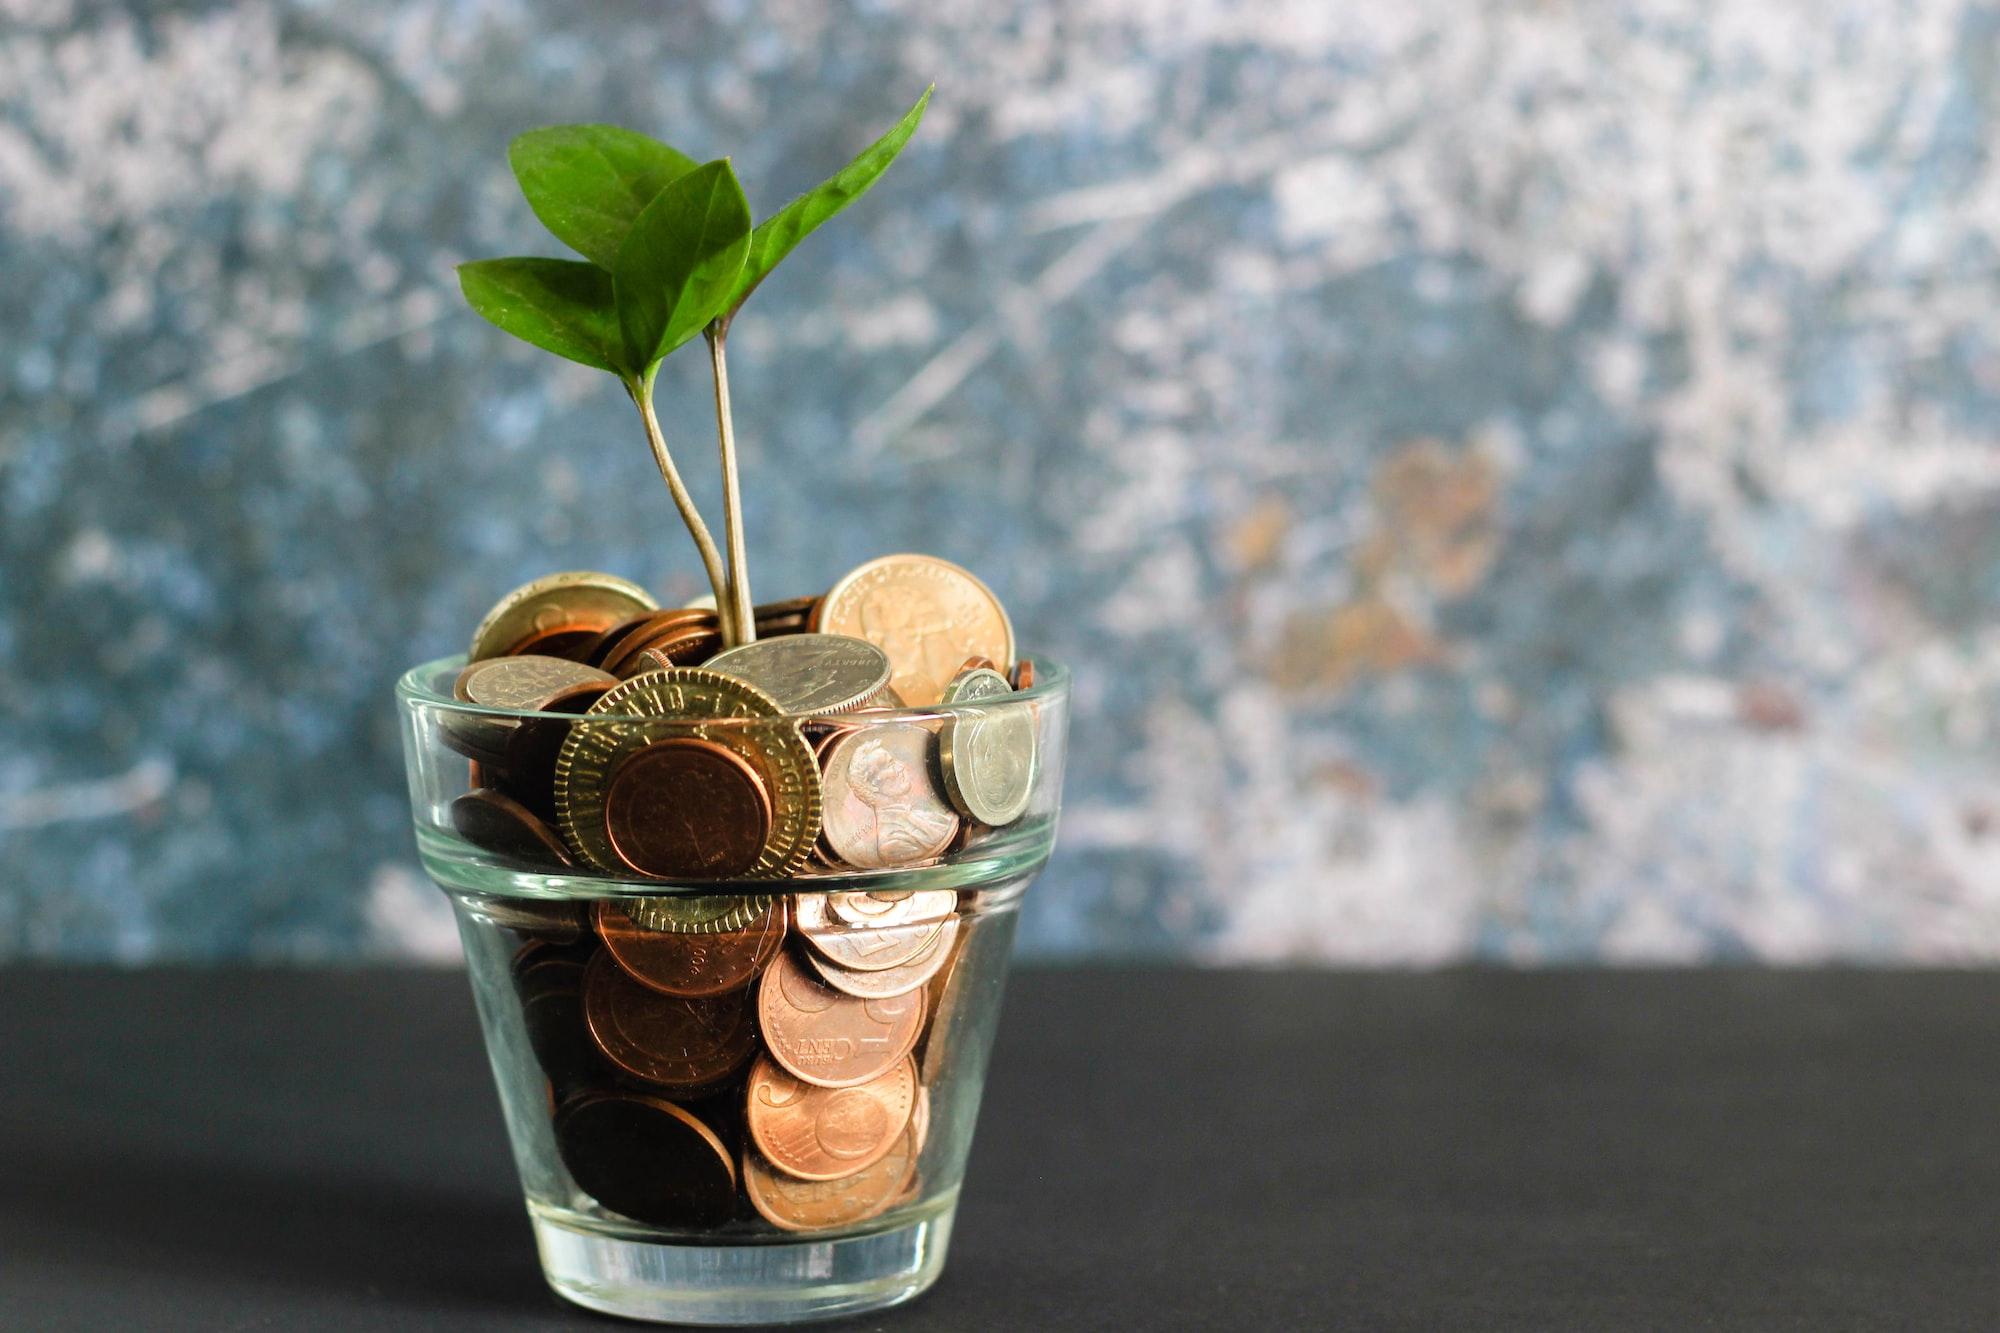 7 Recomendaciones para adquirir una aseguranza de vida económica